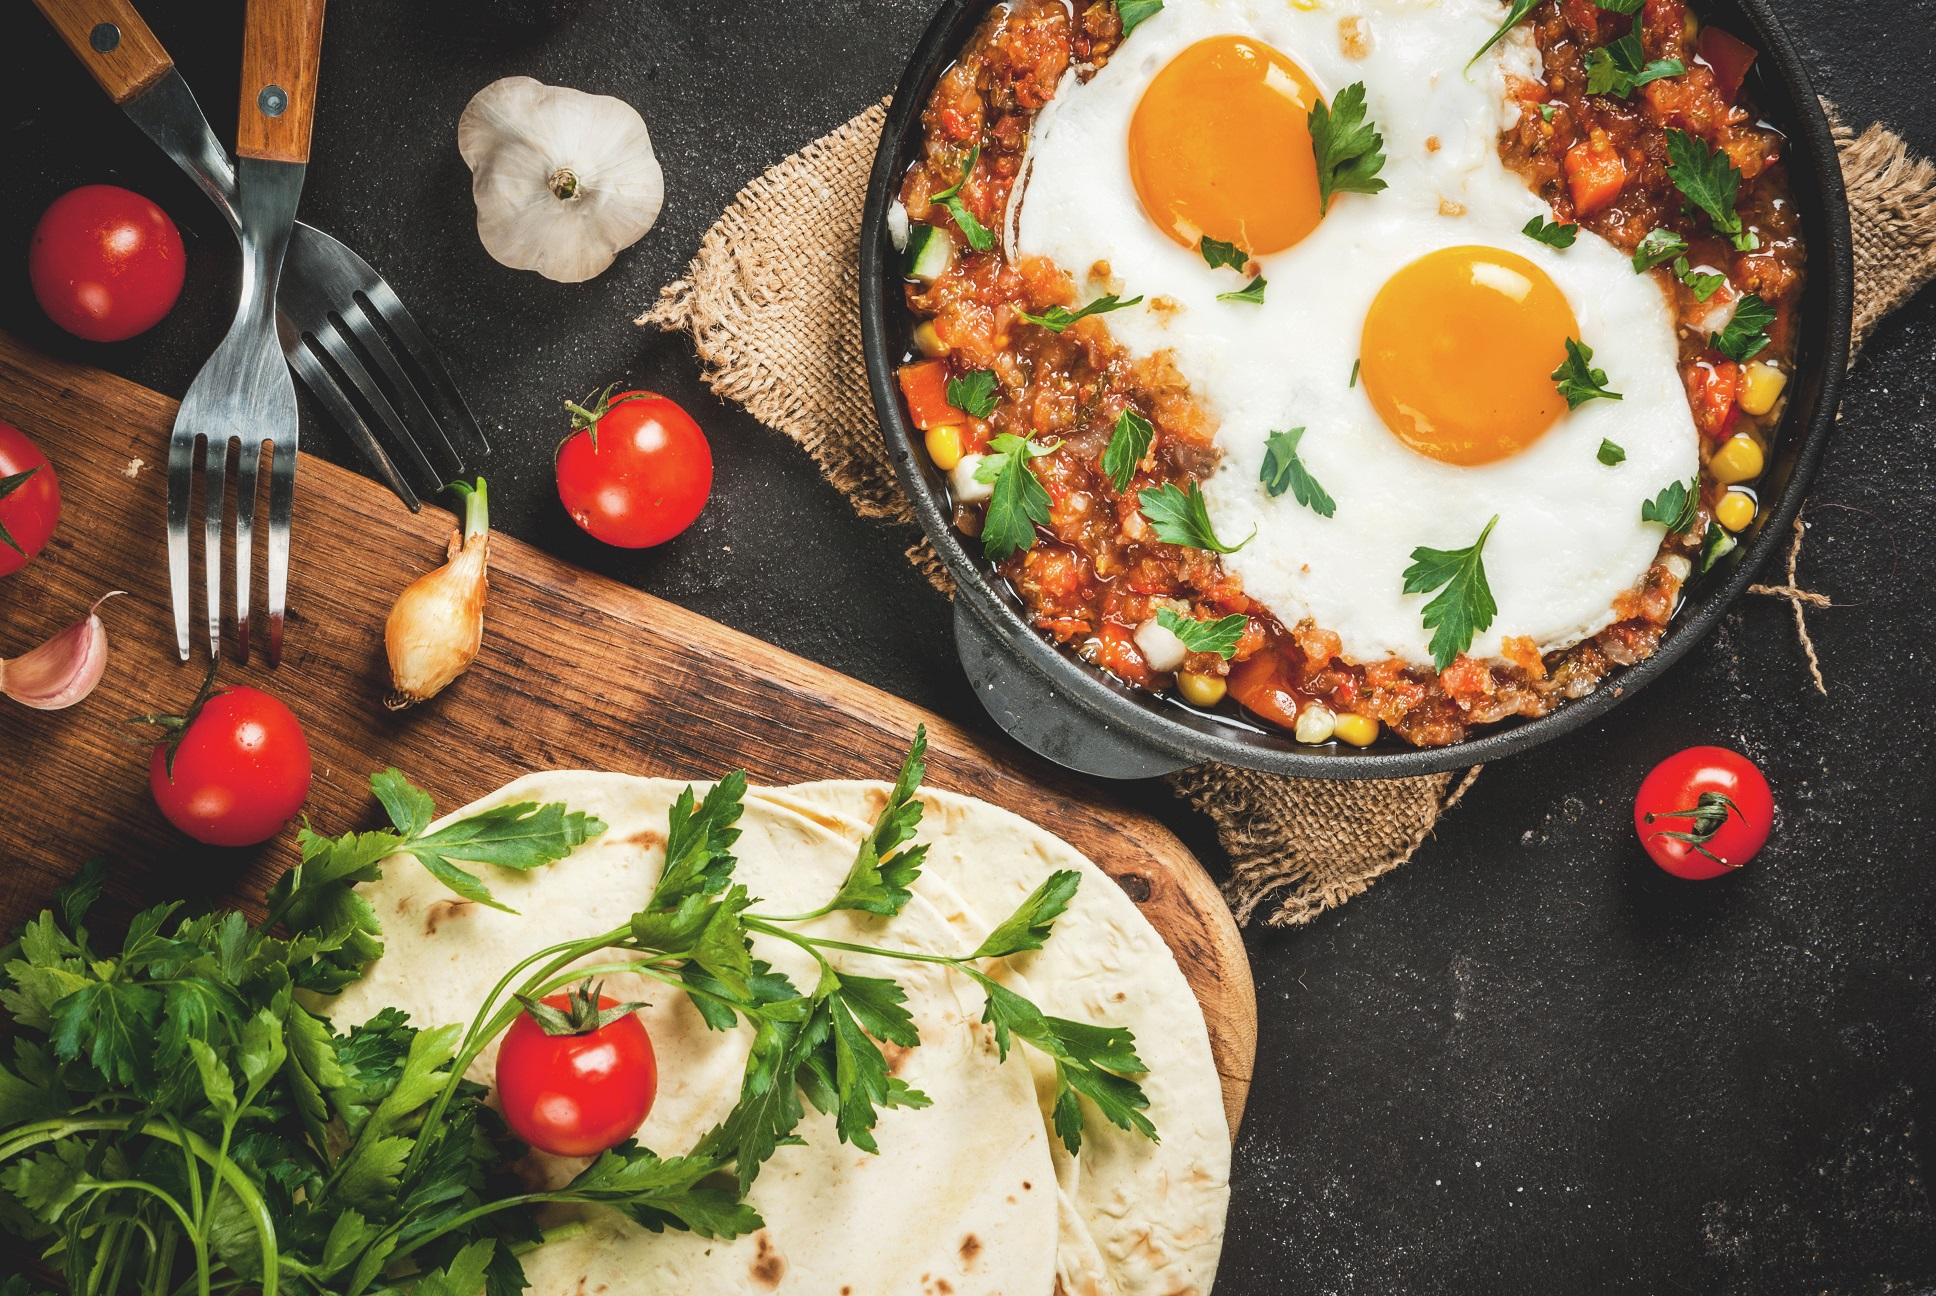 huevos rancheros and tortillas spread out on a table